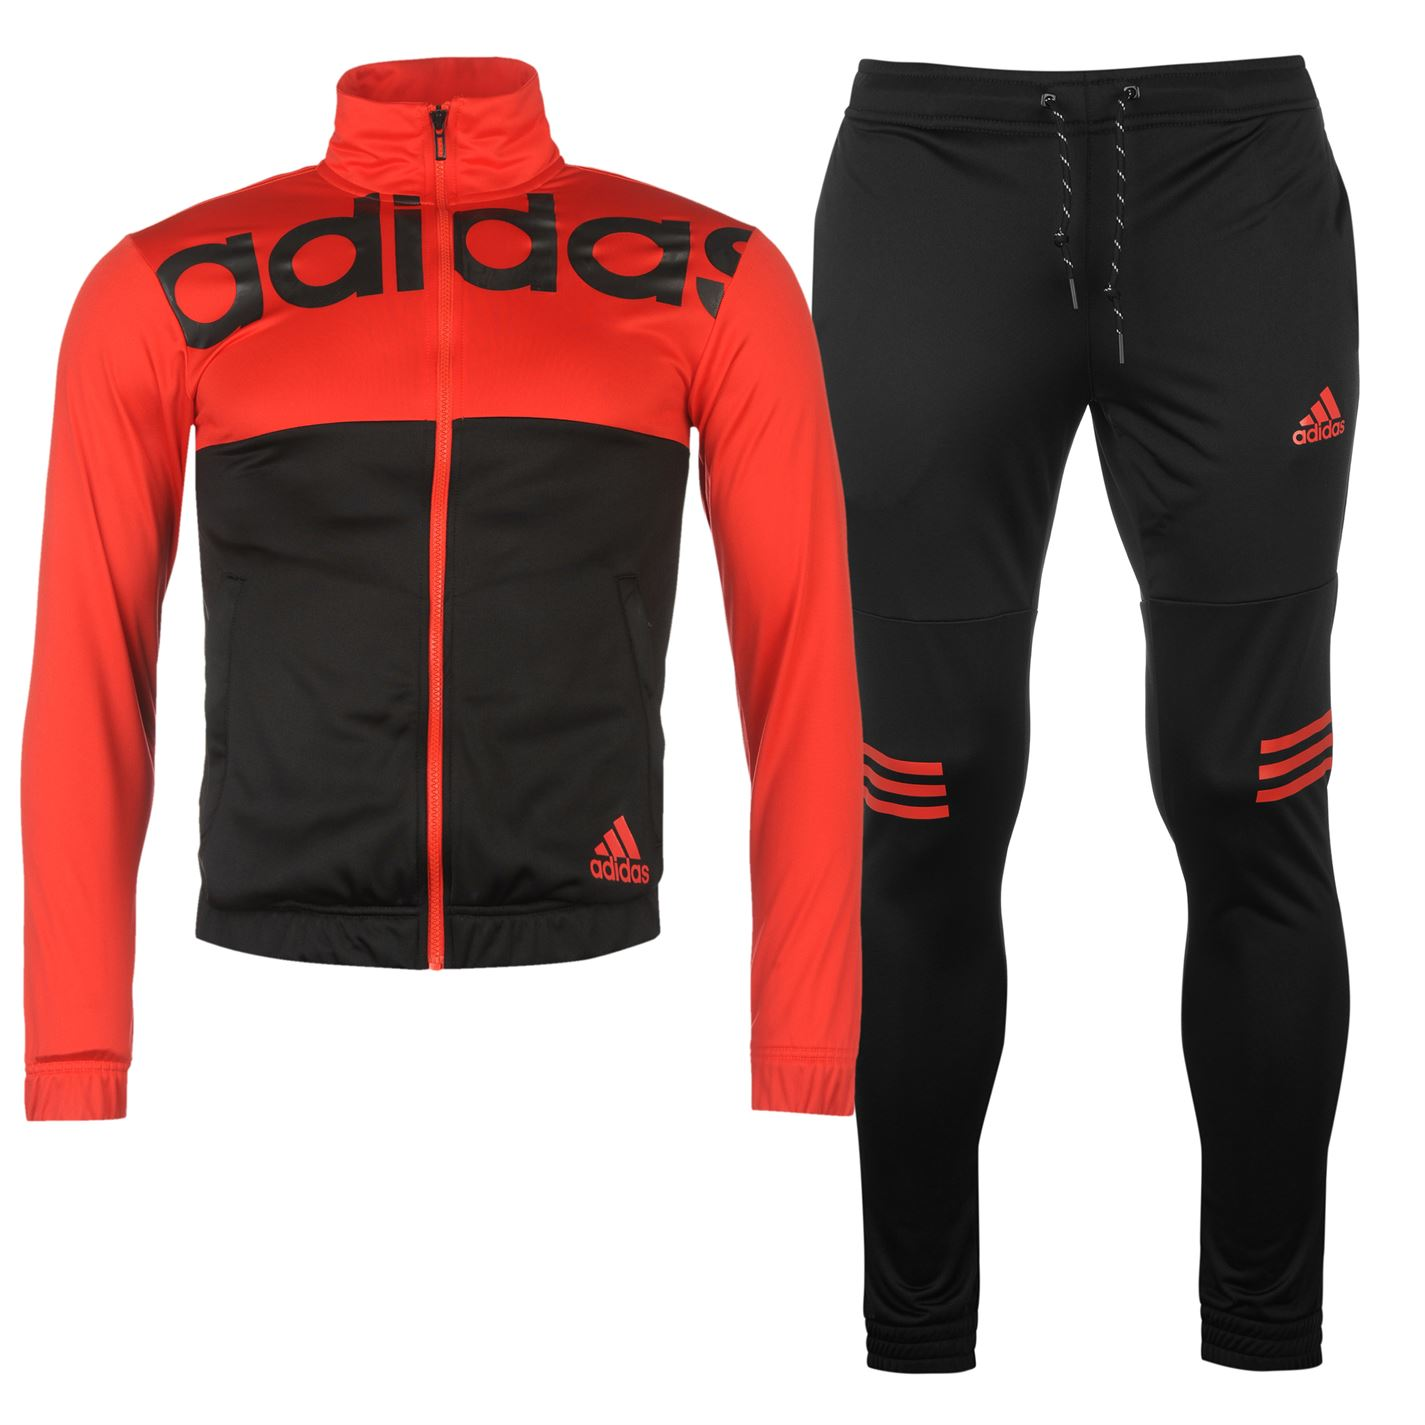 adidas bts herren trainingsanzug anzug fitness ab7445. Black Bedroom Furniture Sets. Home Design Ideas